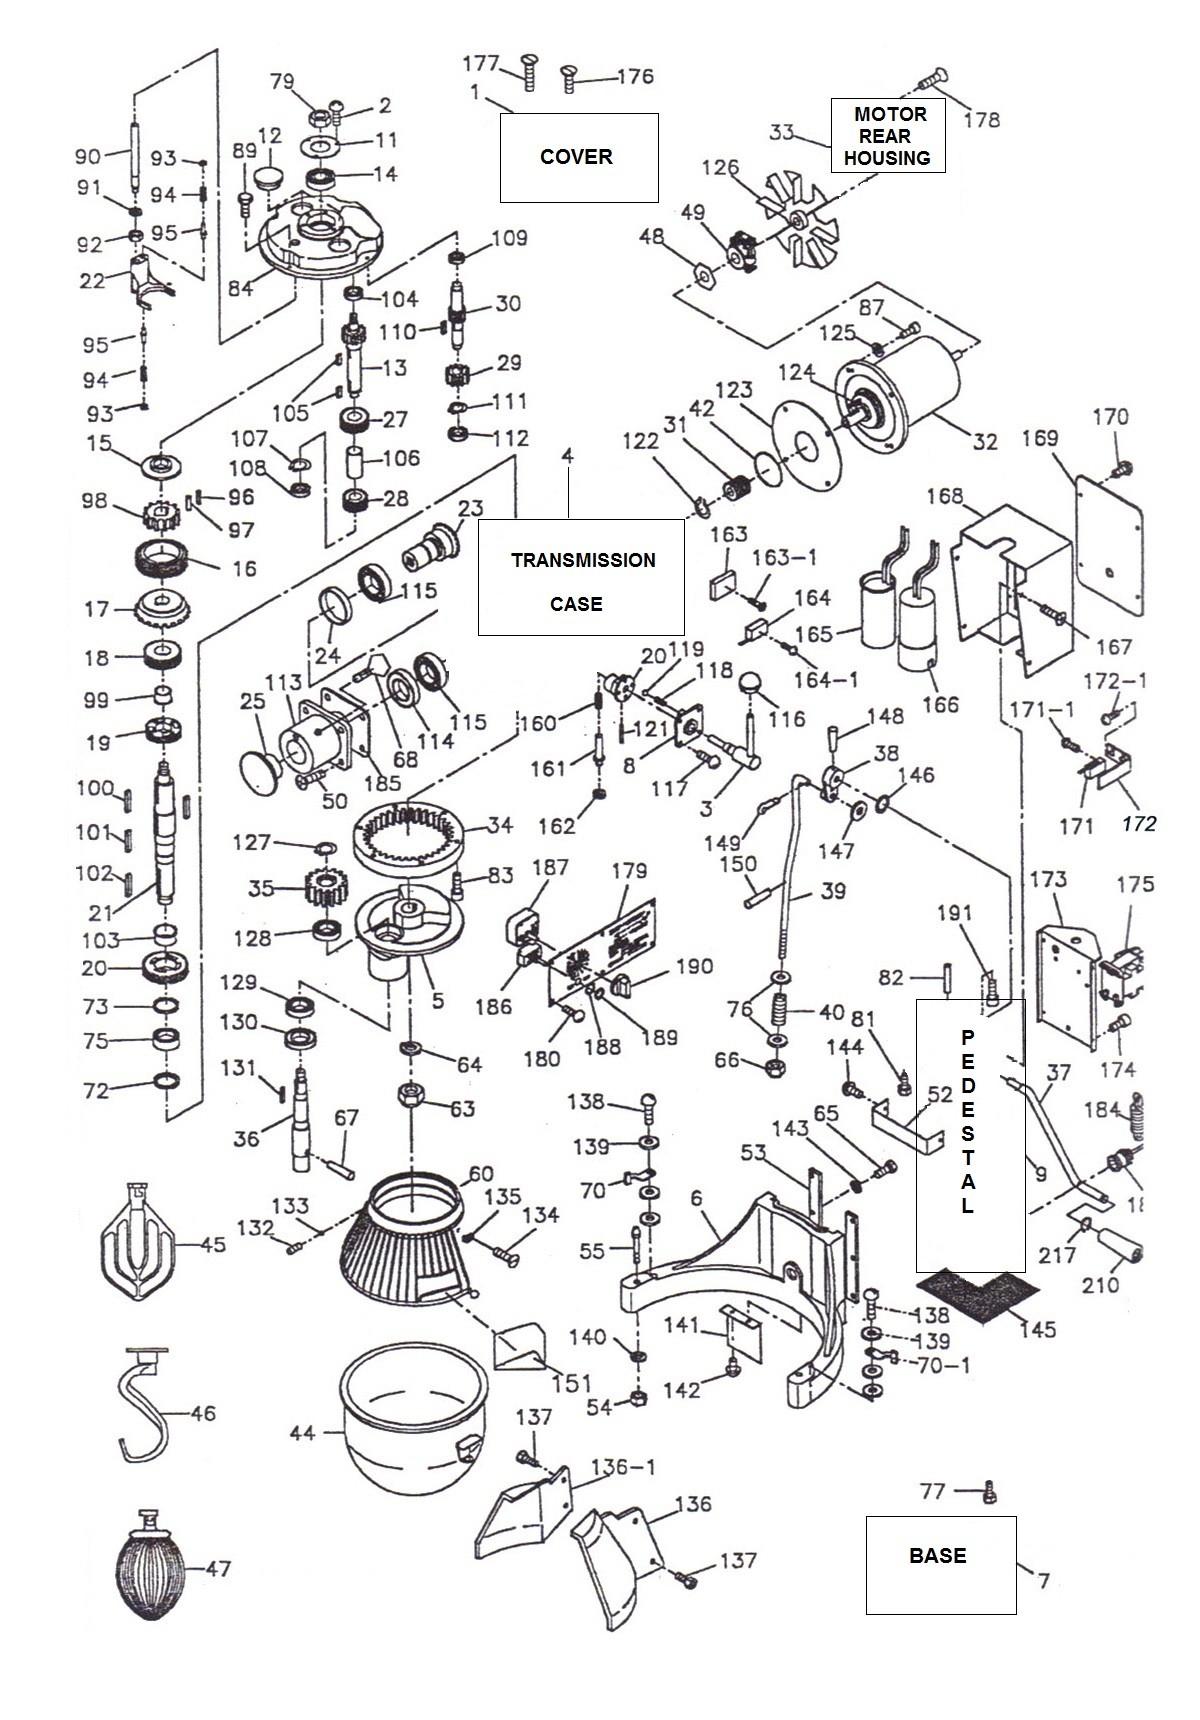 Thunderbird Mixer Wiring Diagram - Wiring Diagrams